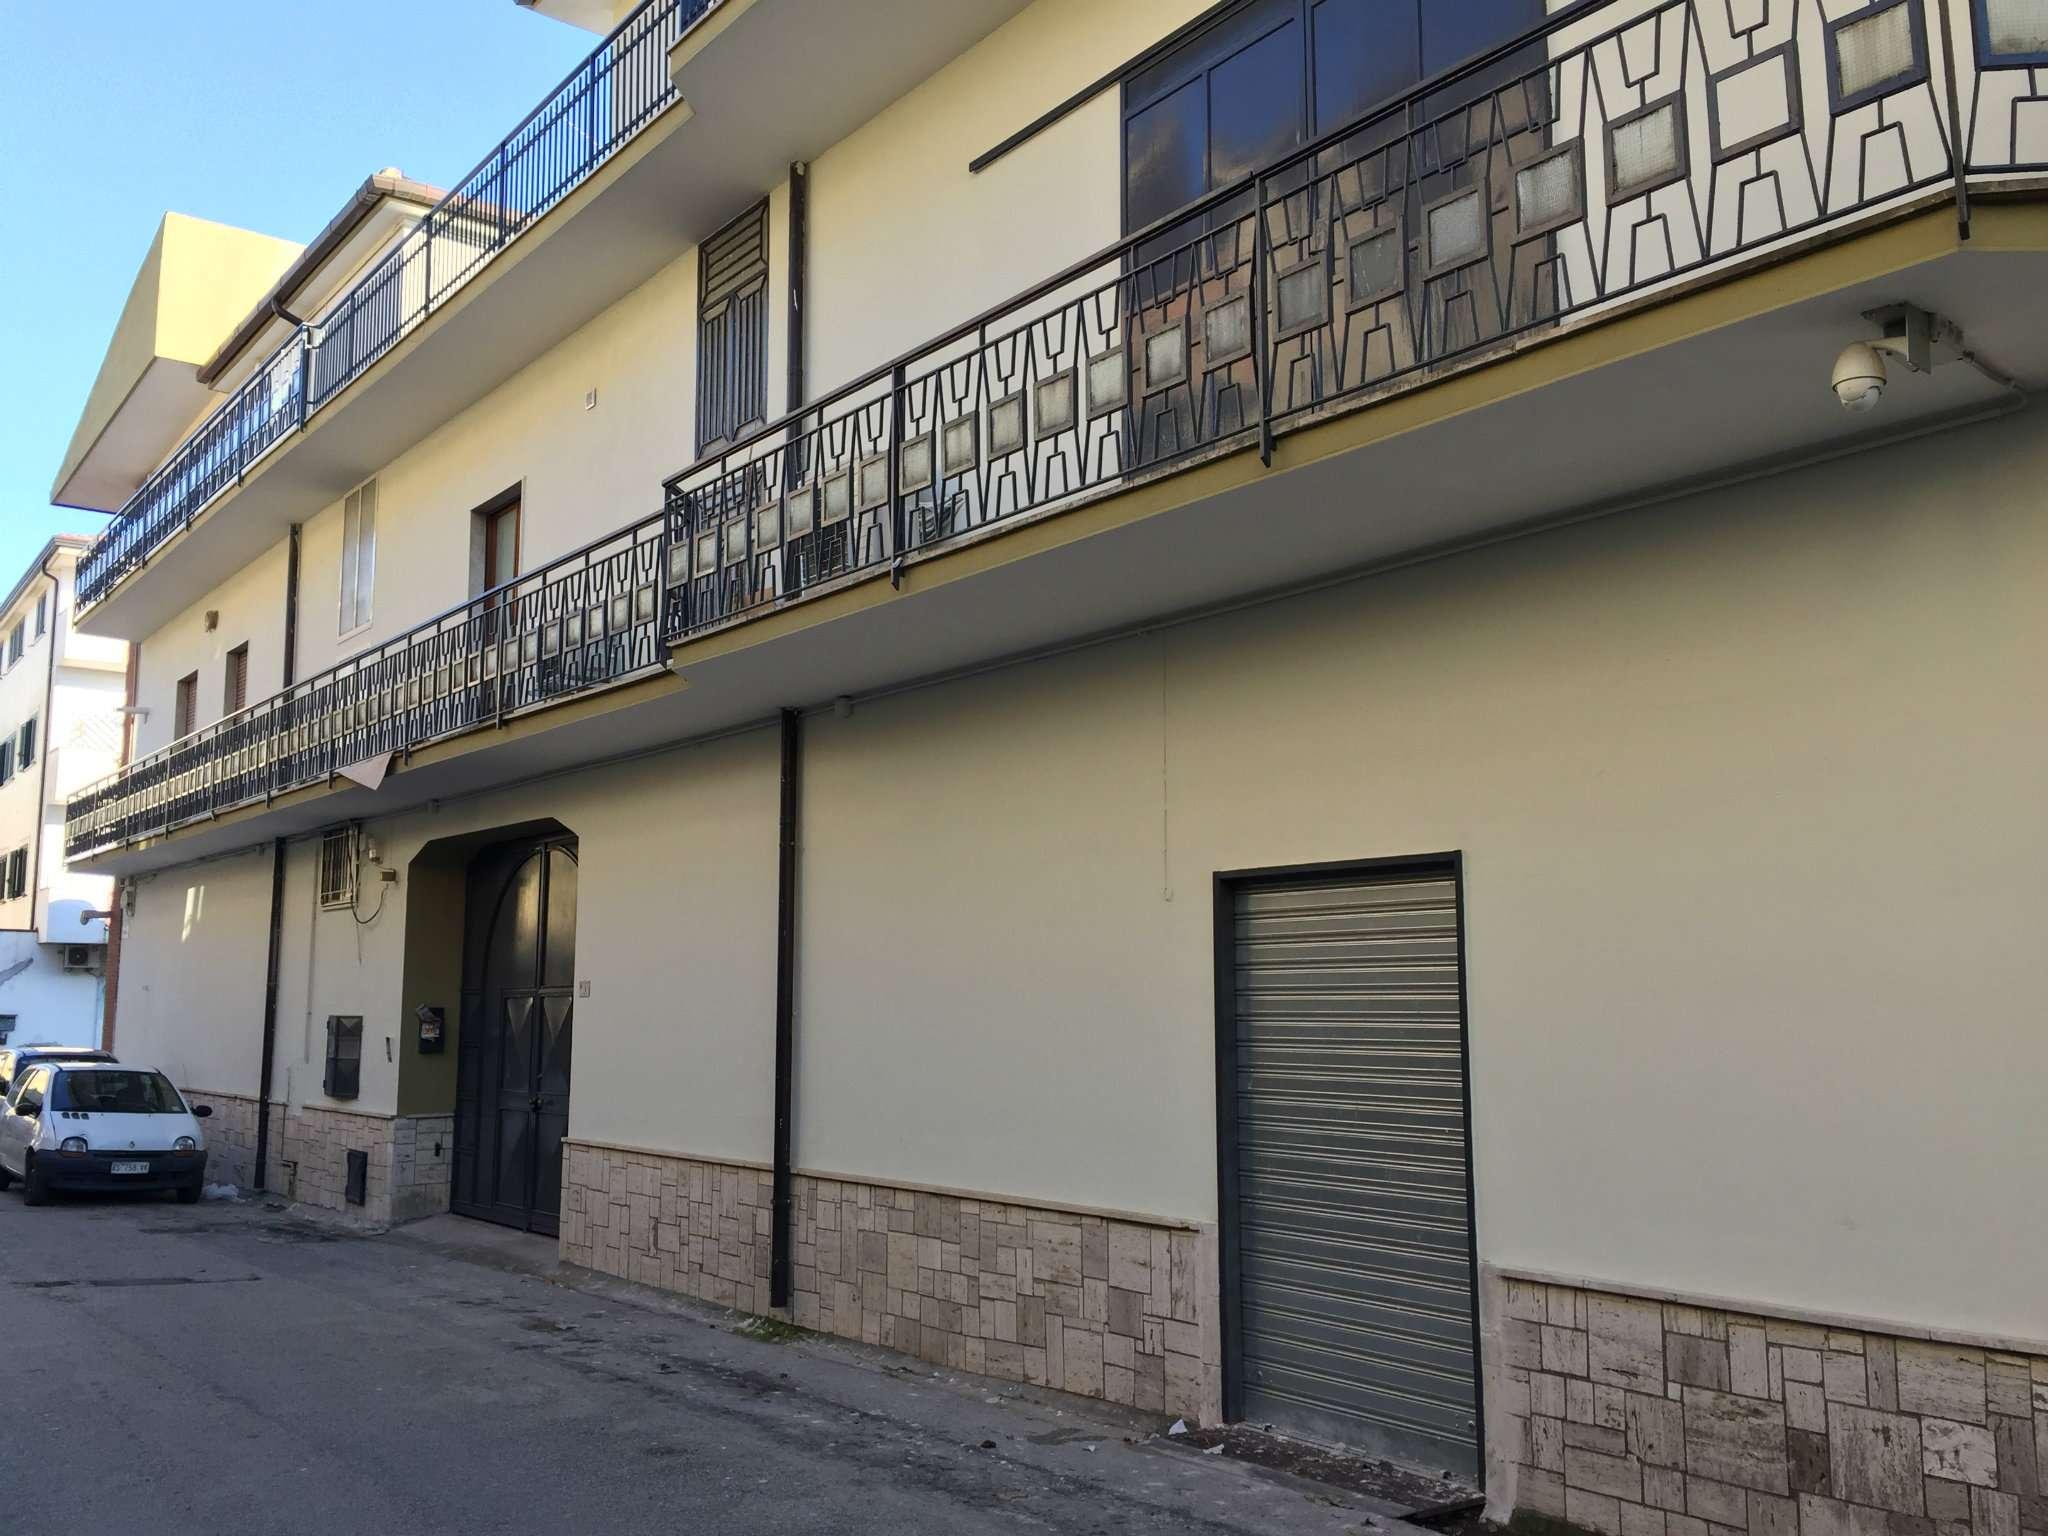 Soluzione Indipendente in vendita a Marcianise, 20 locali, Trattative riservate | Cambio Casa.it